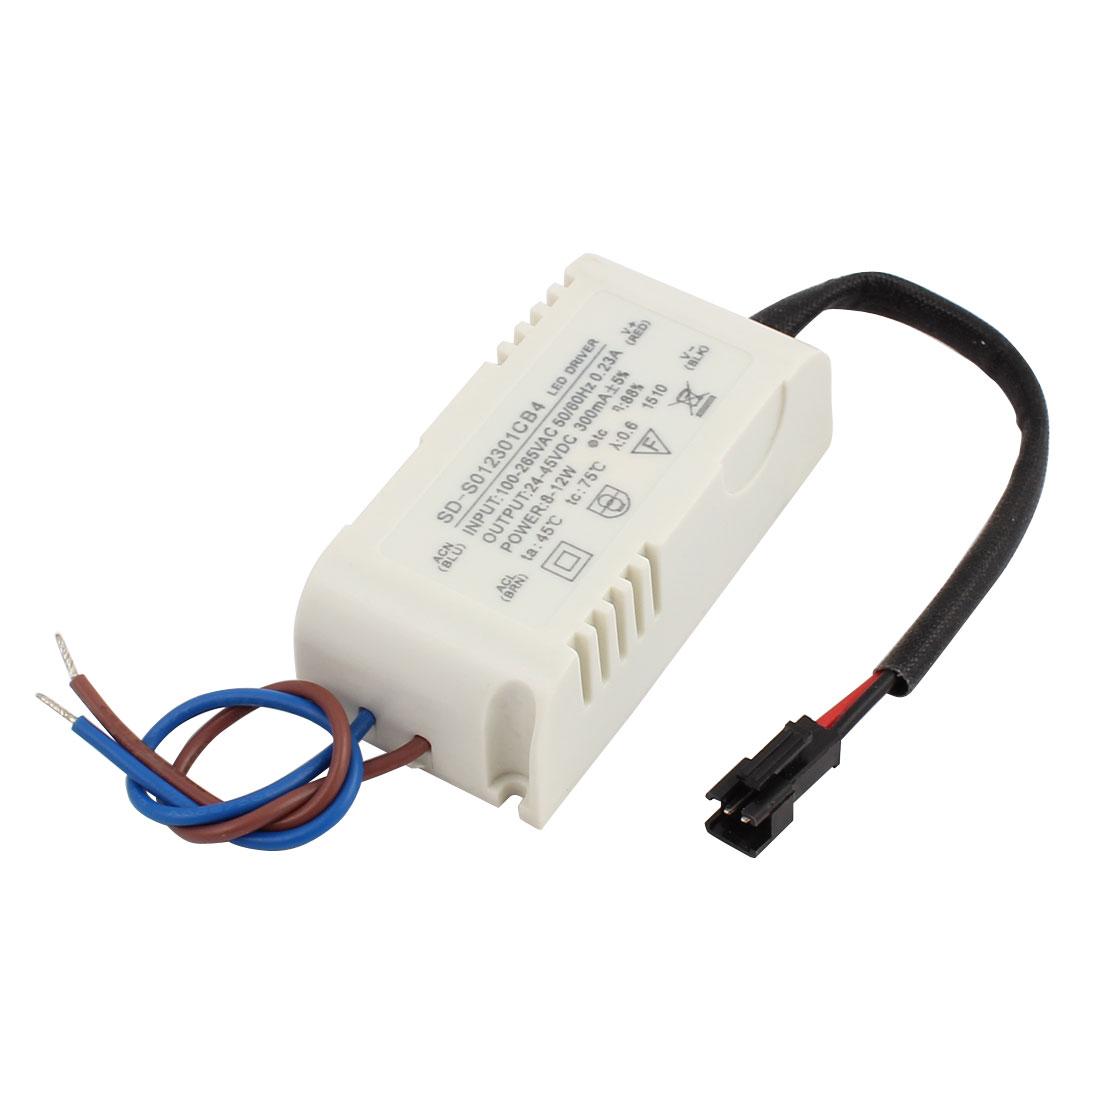 8-12 x 1W Terminal Plastic Shell LED Driver Power Supply Converter